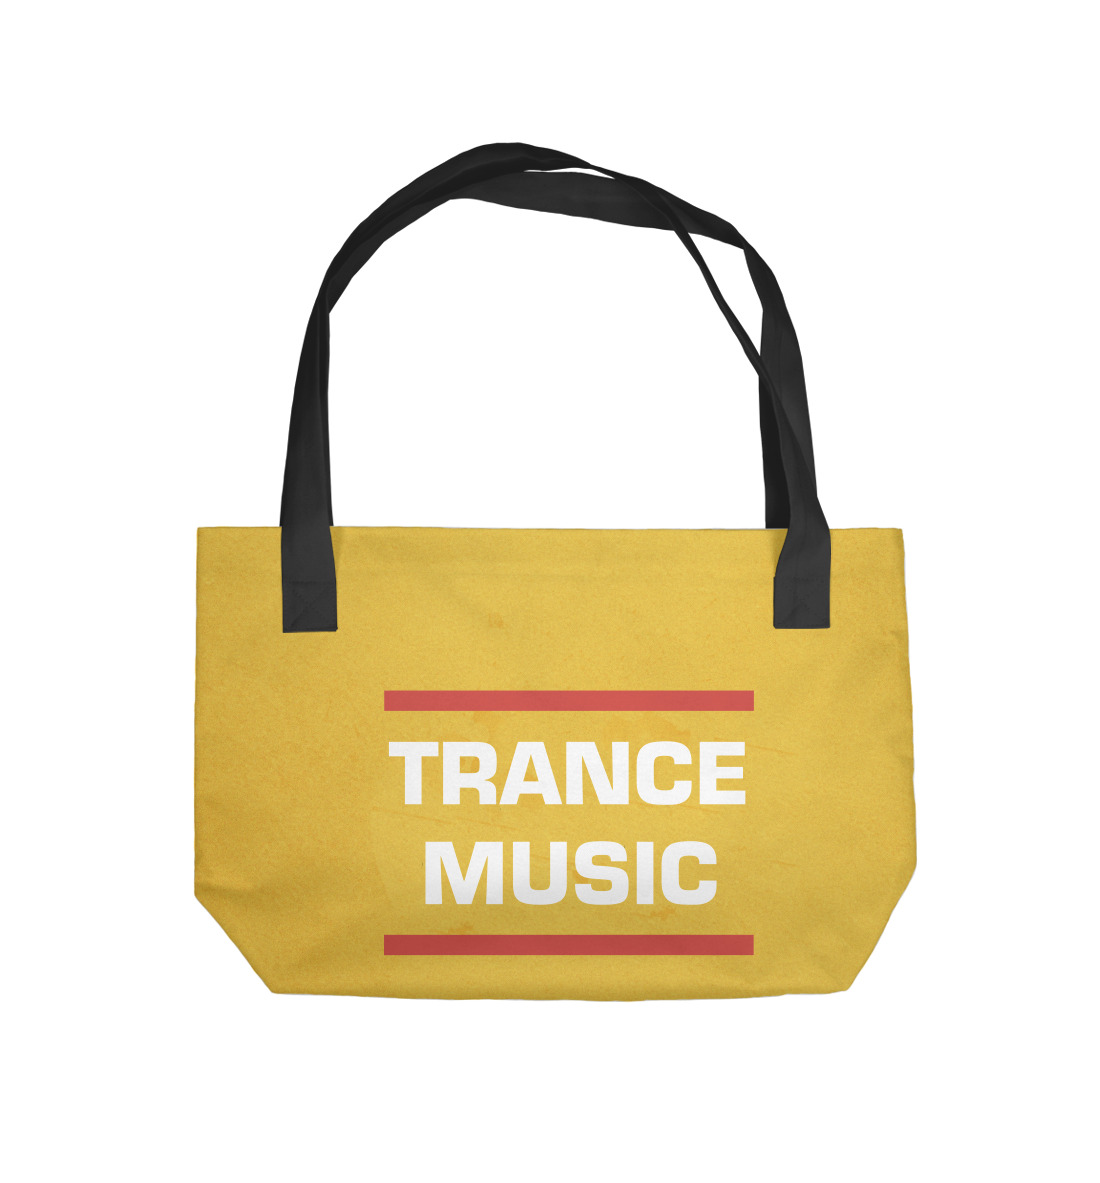 Trance music mikael niemi popular music